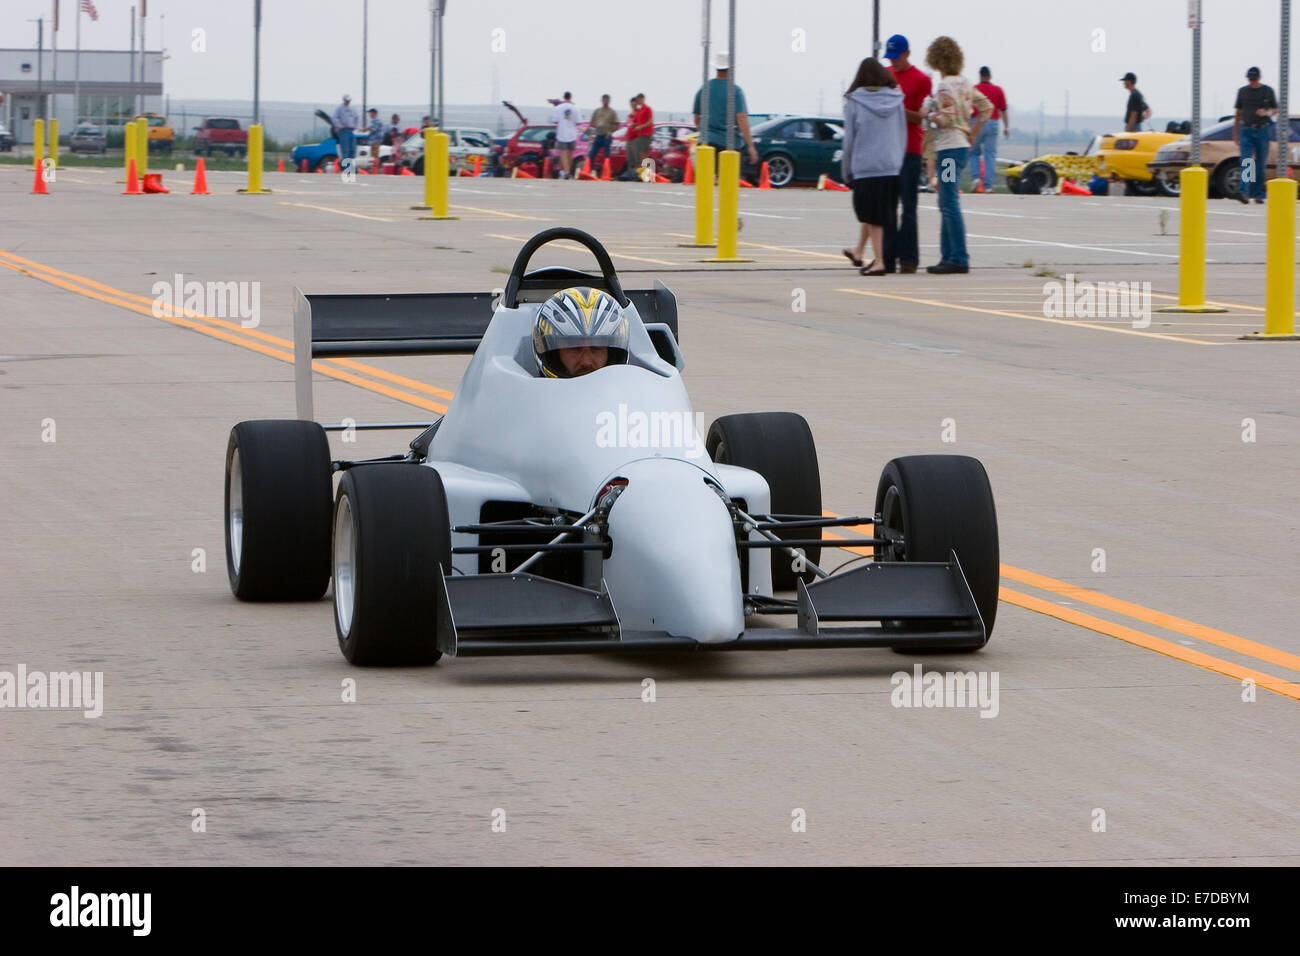 A B Modified Autocross Race Car In Regional Sports Club Of America SCCA Event